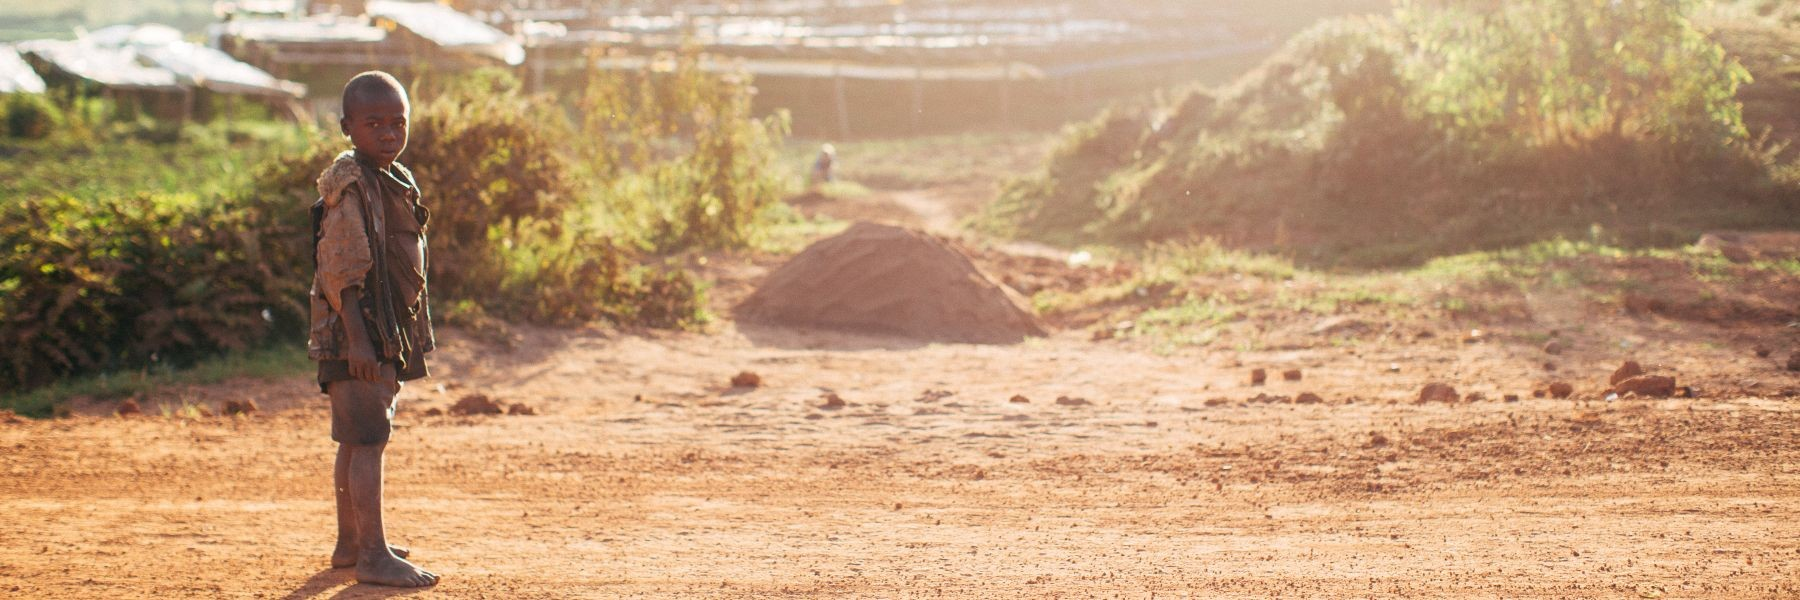 Burundi - Long miles coffee project